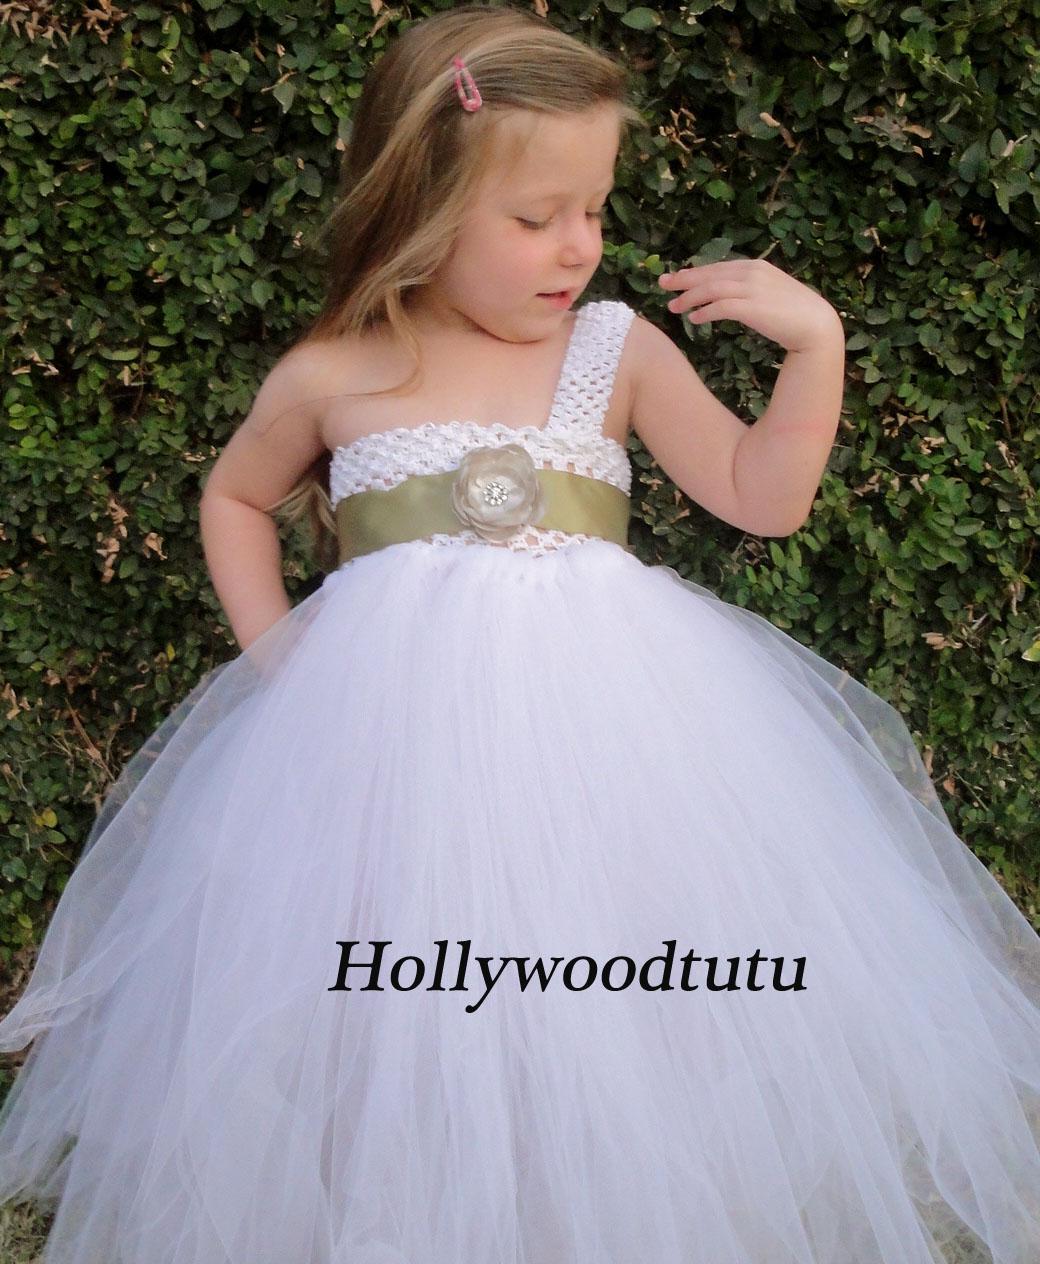 Hollywoodtutu Dresses Baby Girl Silvergreen And White Flower Girl